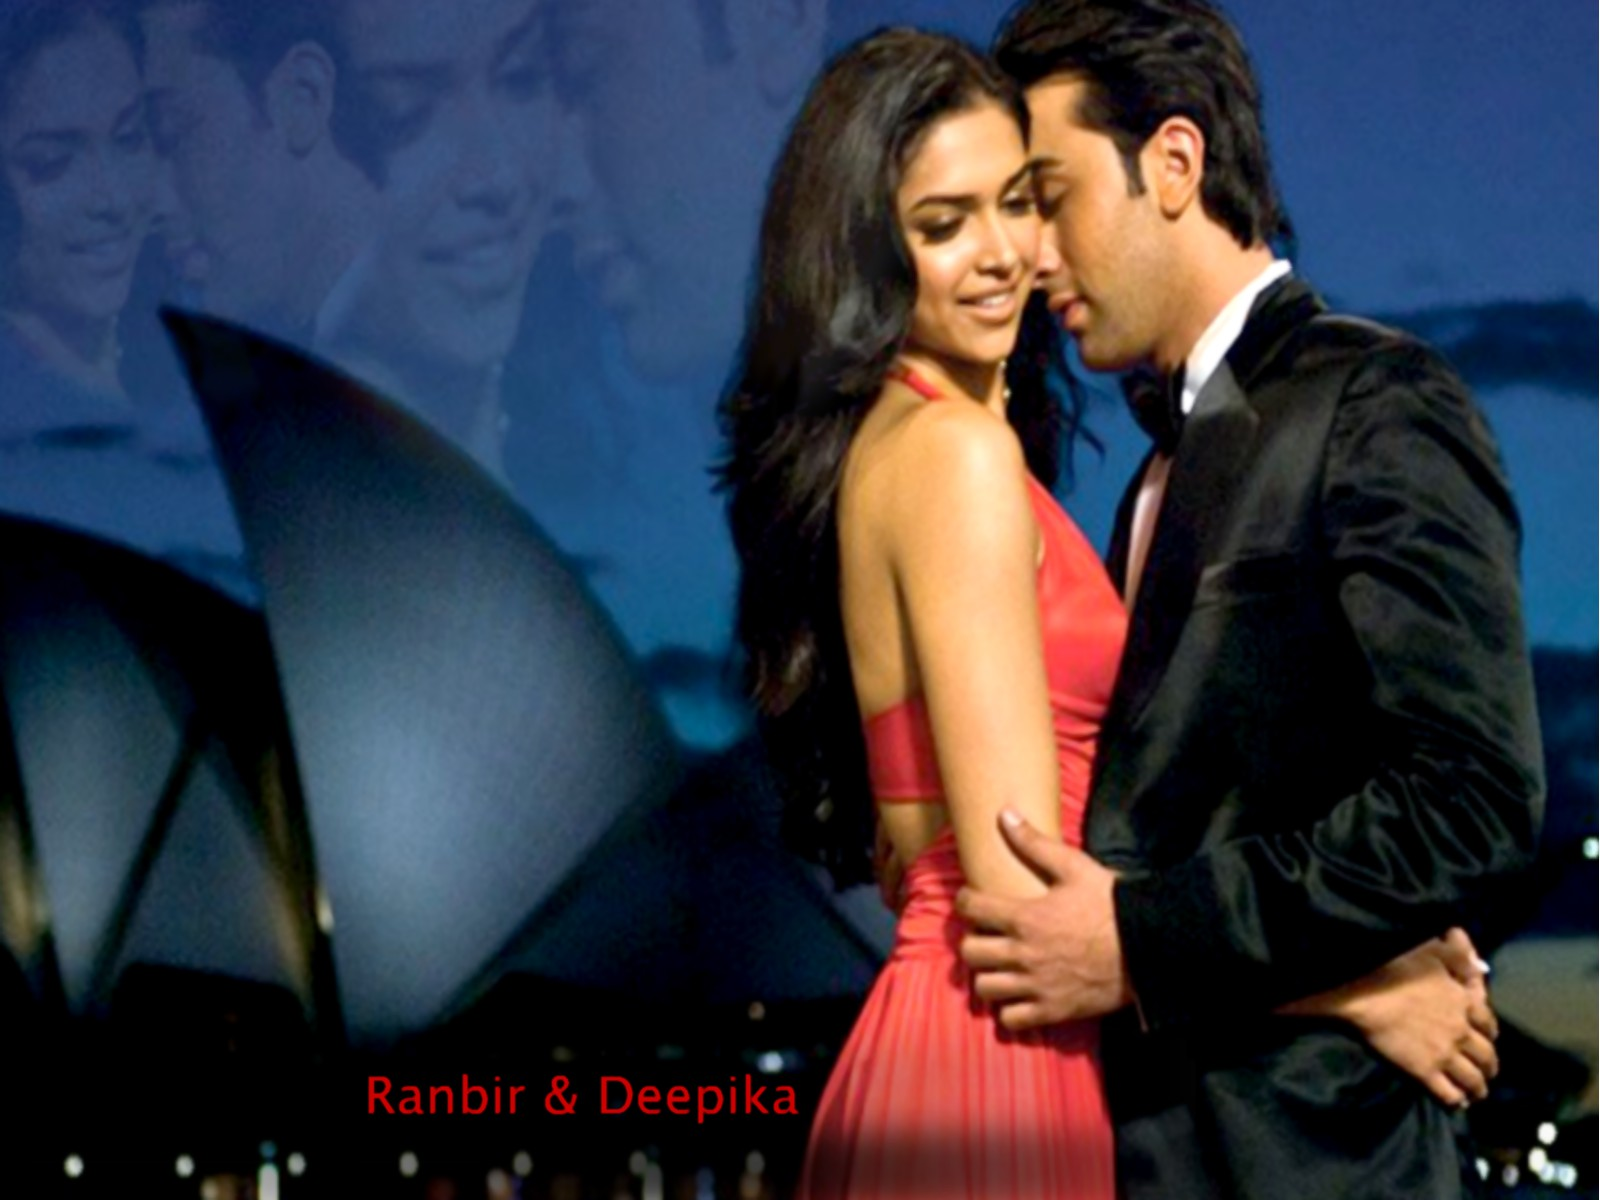 Ranbir Kapoor Deepika Padukone Wallpaper | Celebrity ...